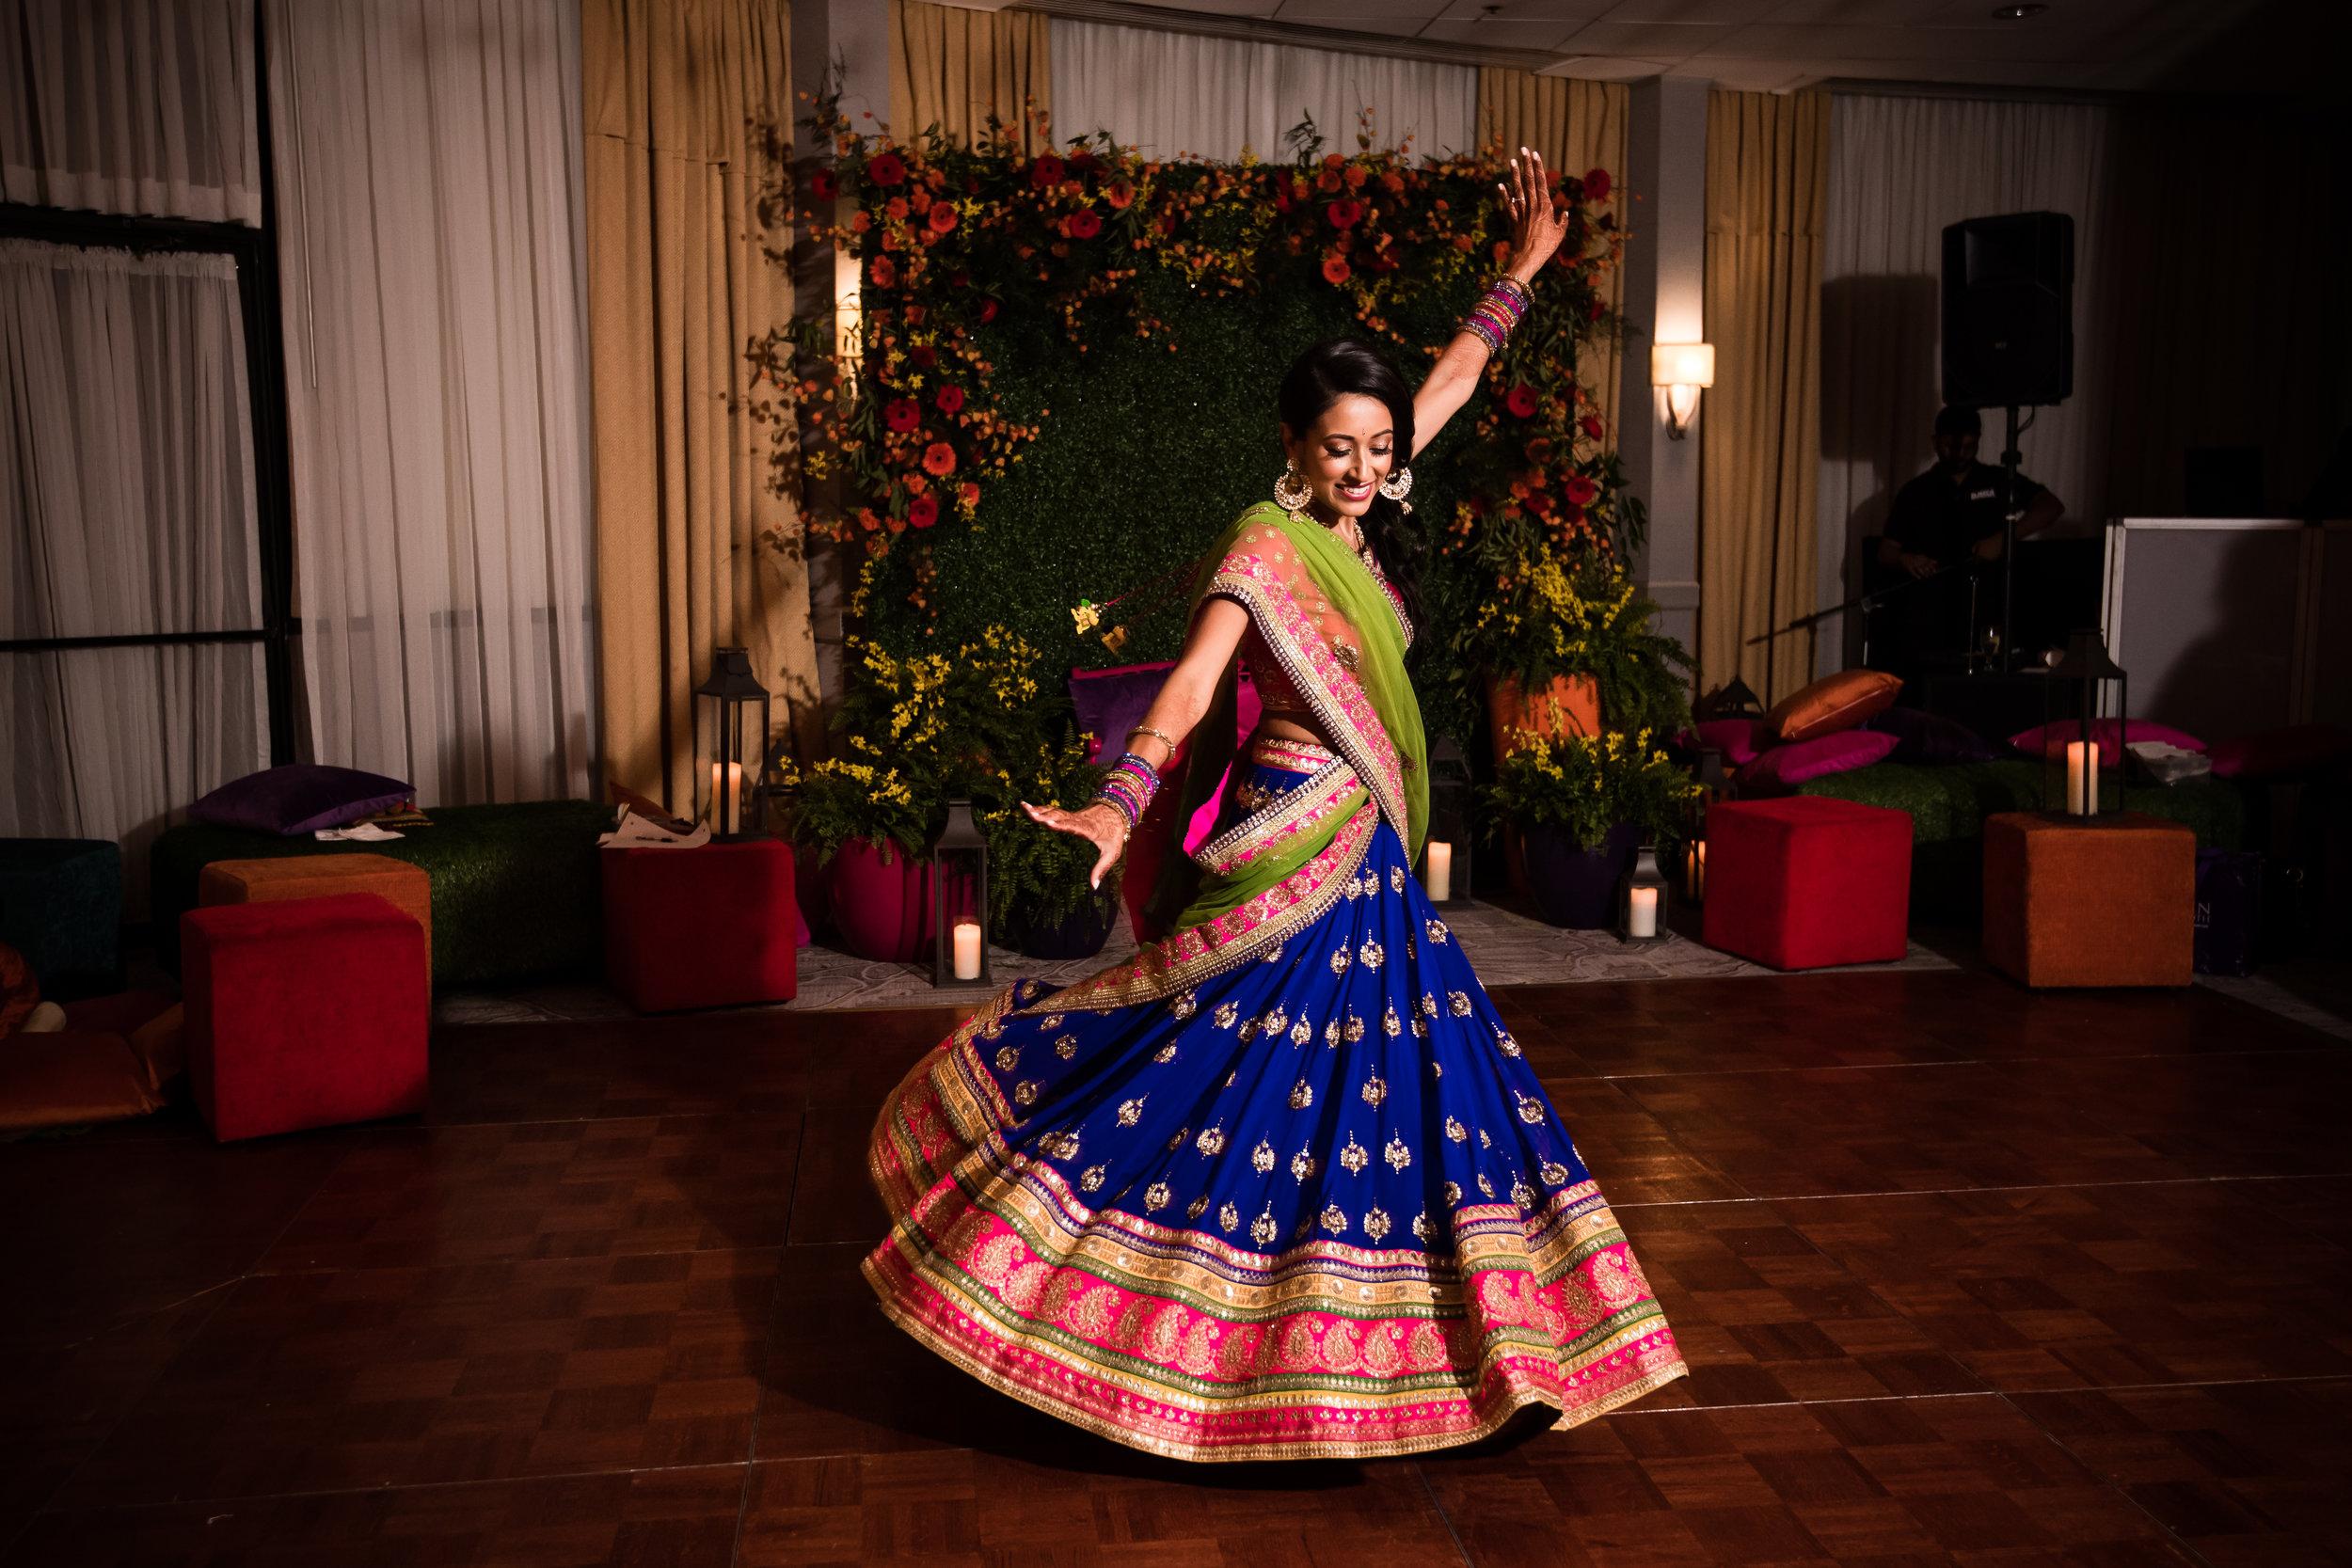 INDIAN WEDDING SANGEET BRIDE DANCING.jpg